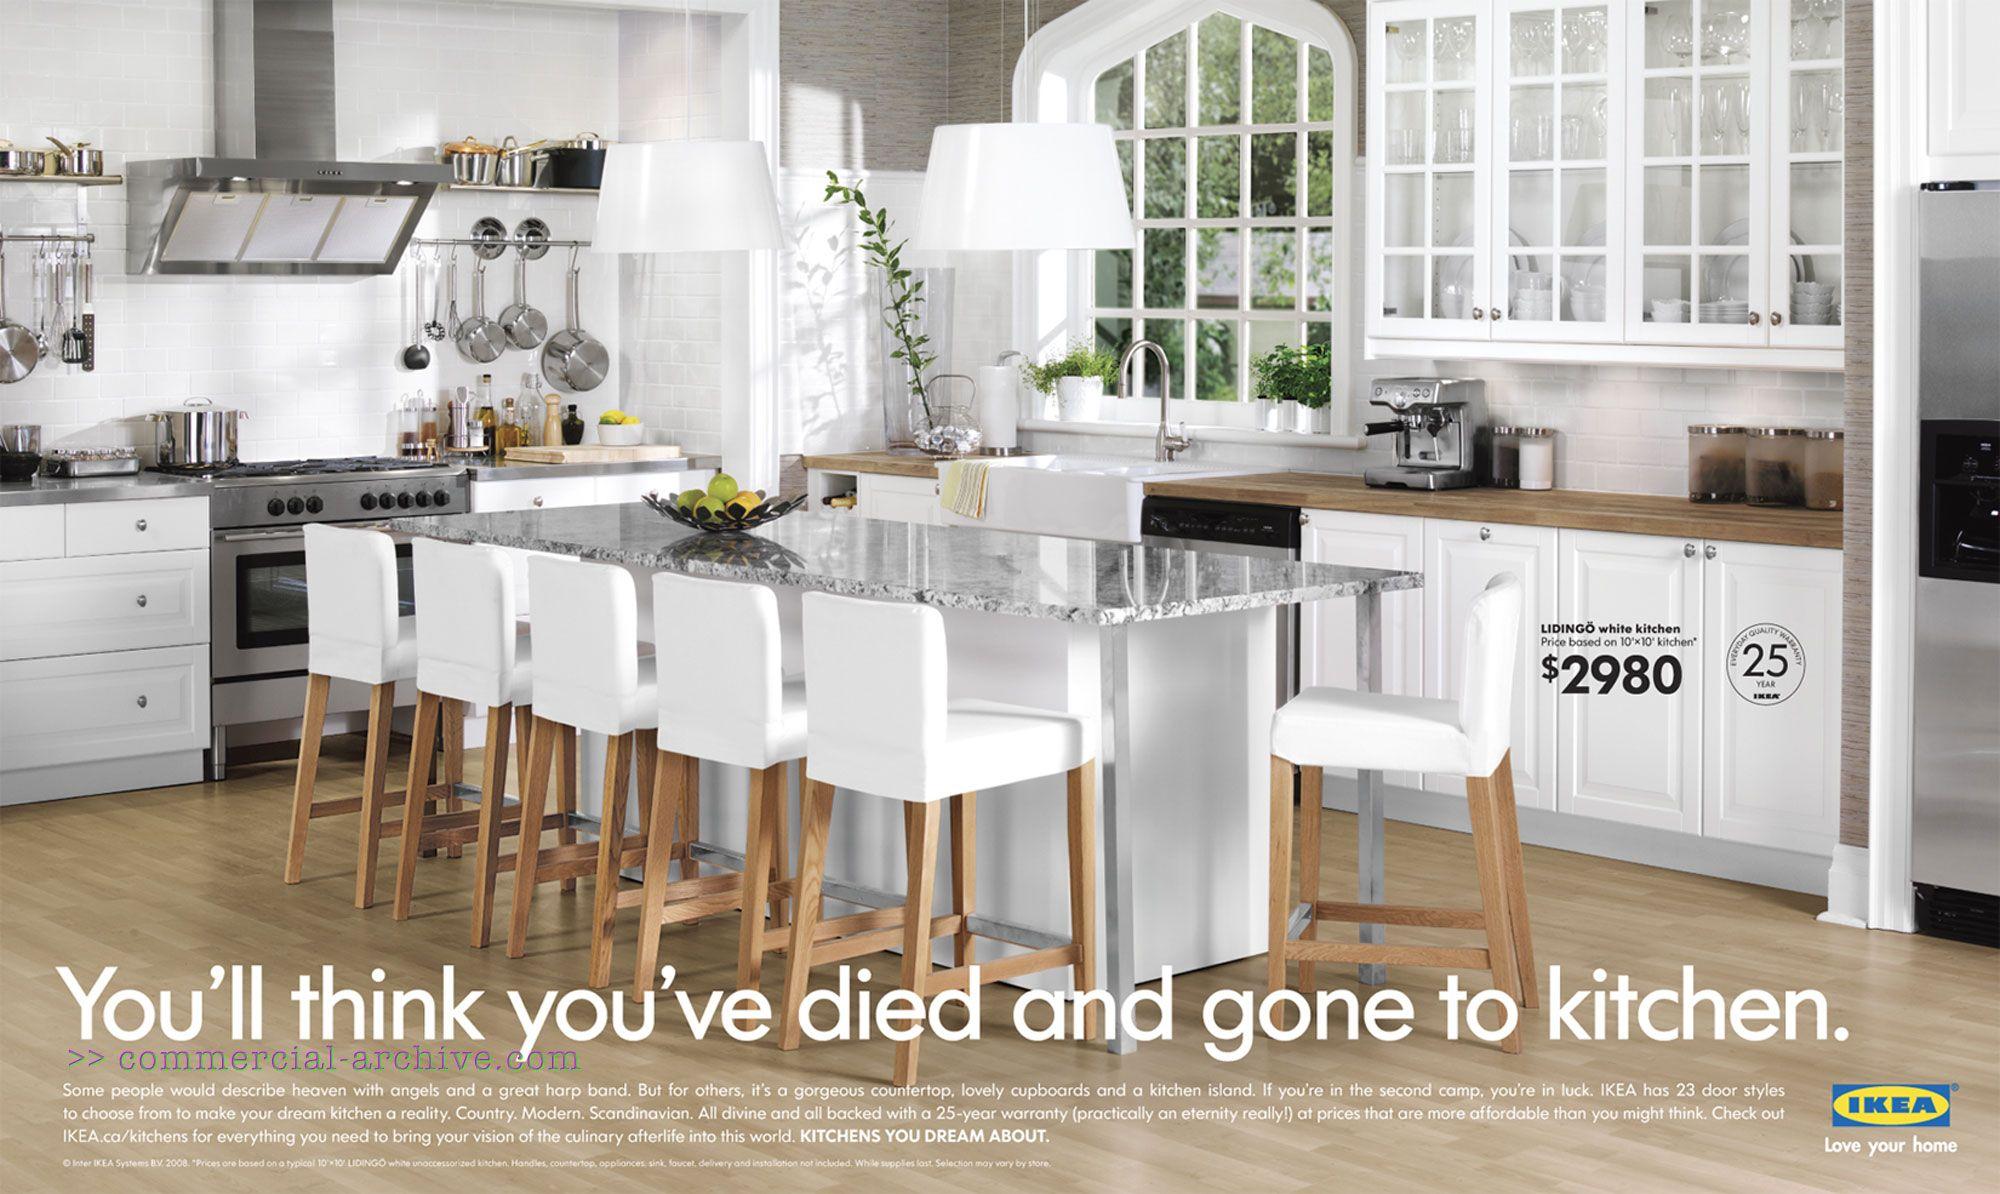 kitchen cabinets kitchen design seductive ikea kitchen designer ikea kitchen design Seductive Ikea Kitchen Designer Montreal Images Kitchen Furniture